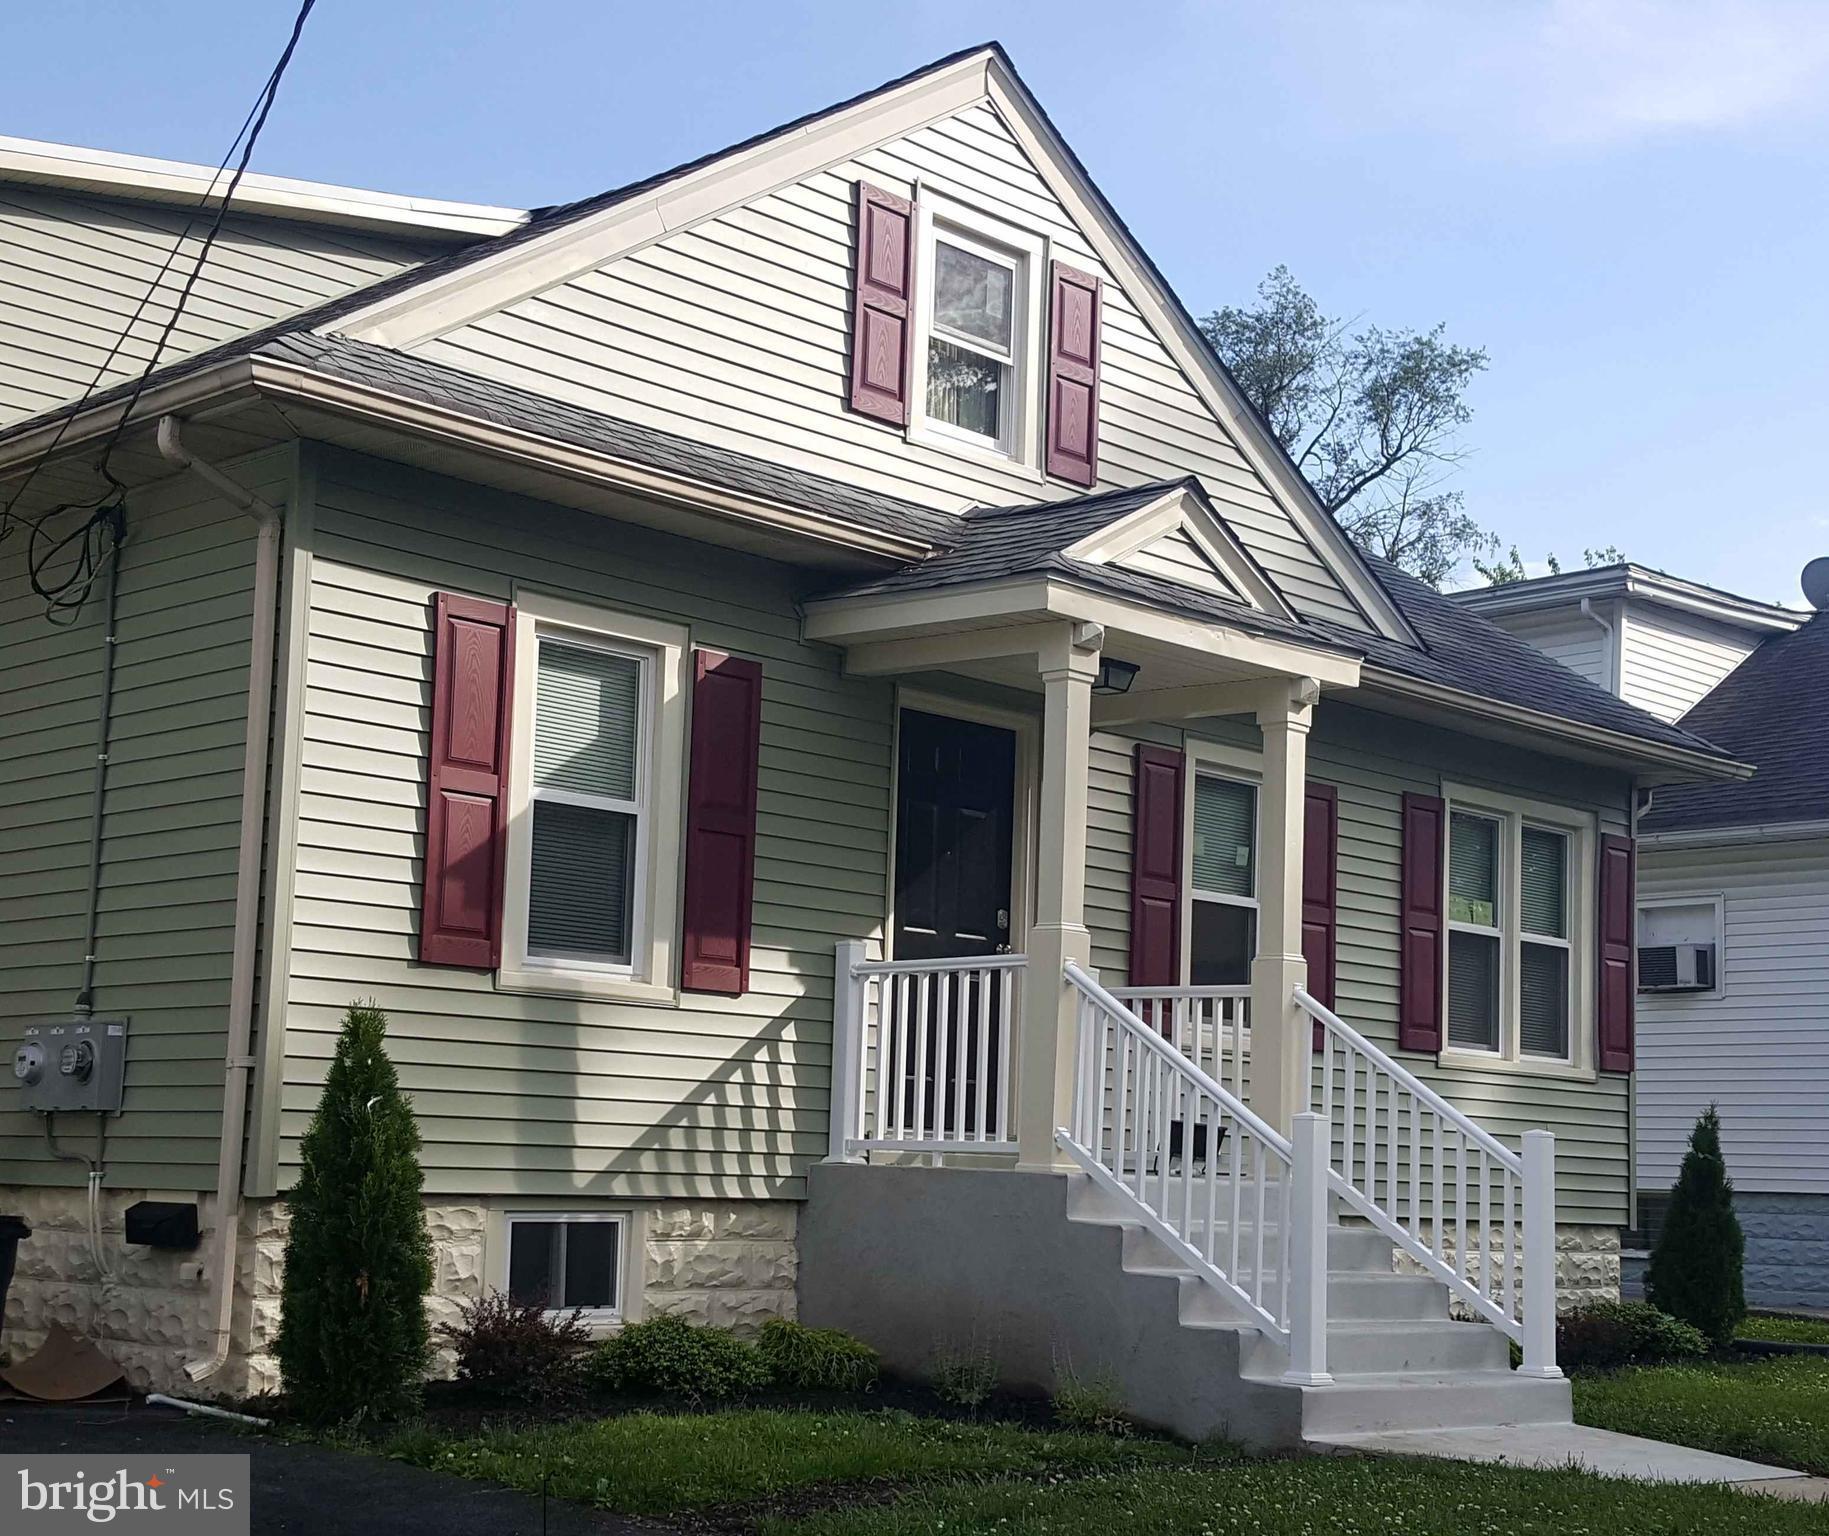 118 E CLINTON AVENUE, HADDON TOWNSHIP, NJ 08107